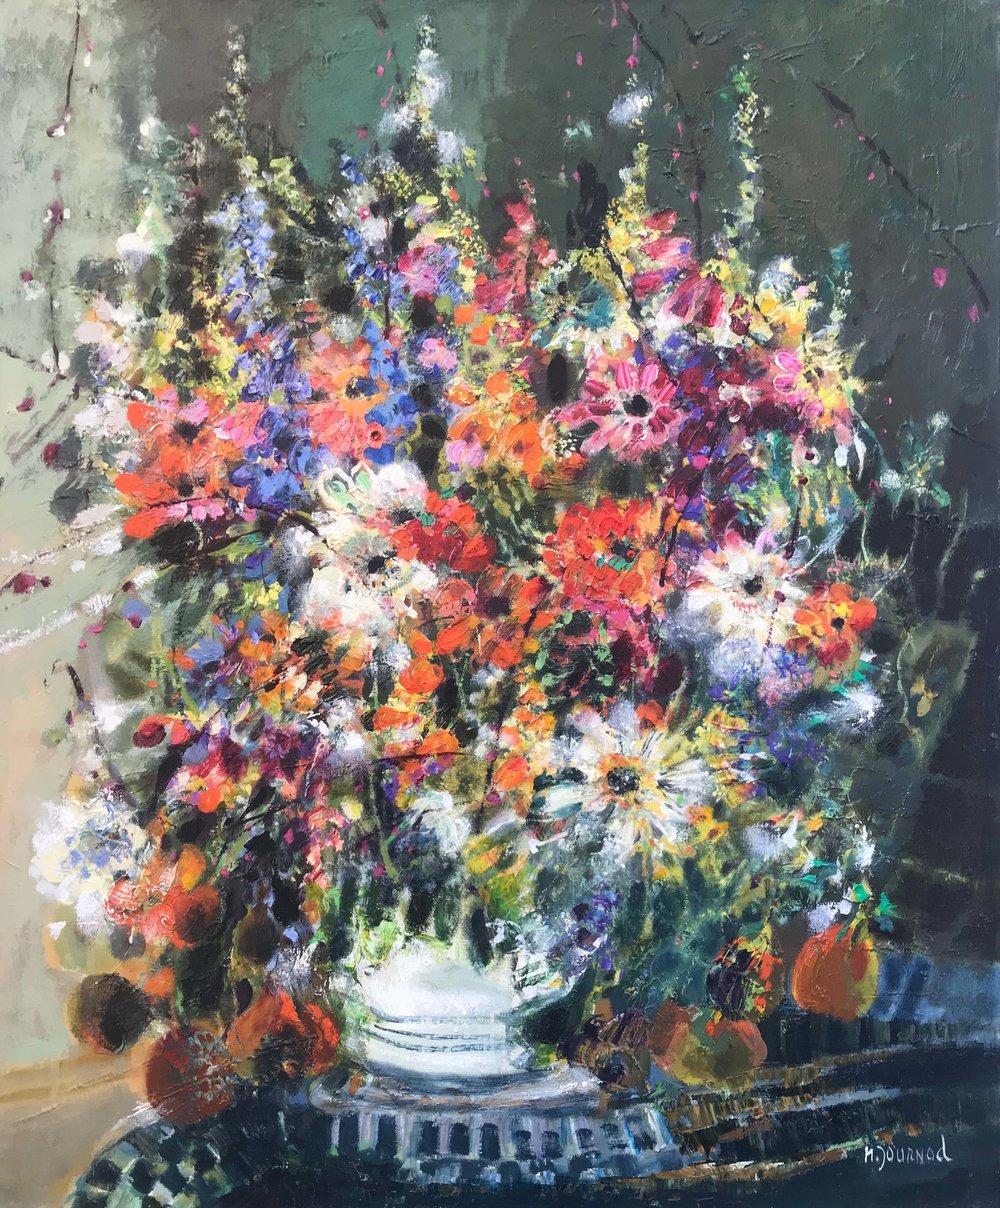 Journod-#251-Le Bouquet Jaune-24 x 29-Unframed for web.jpg